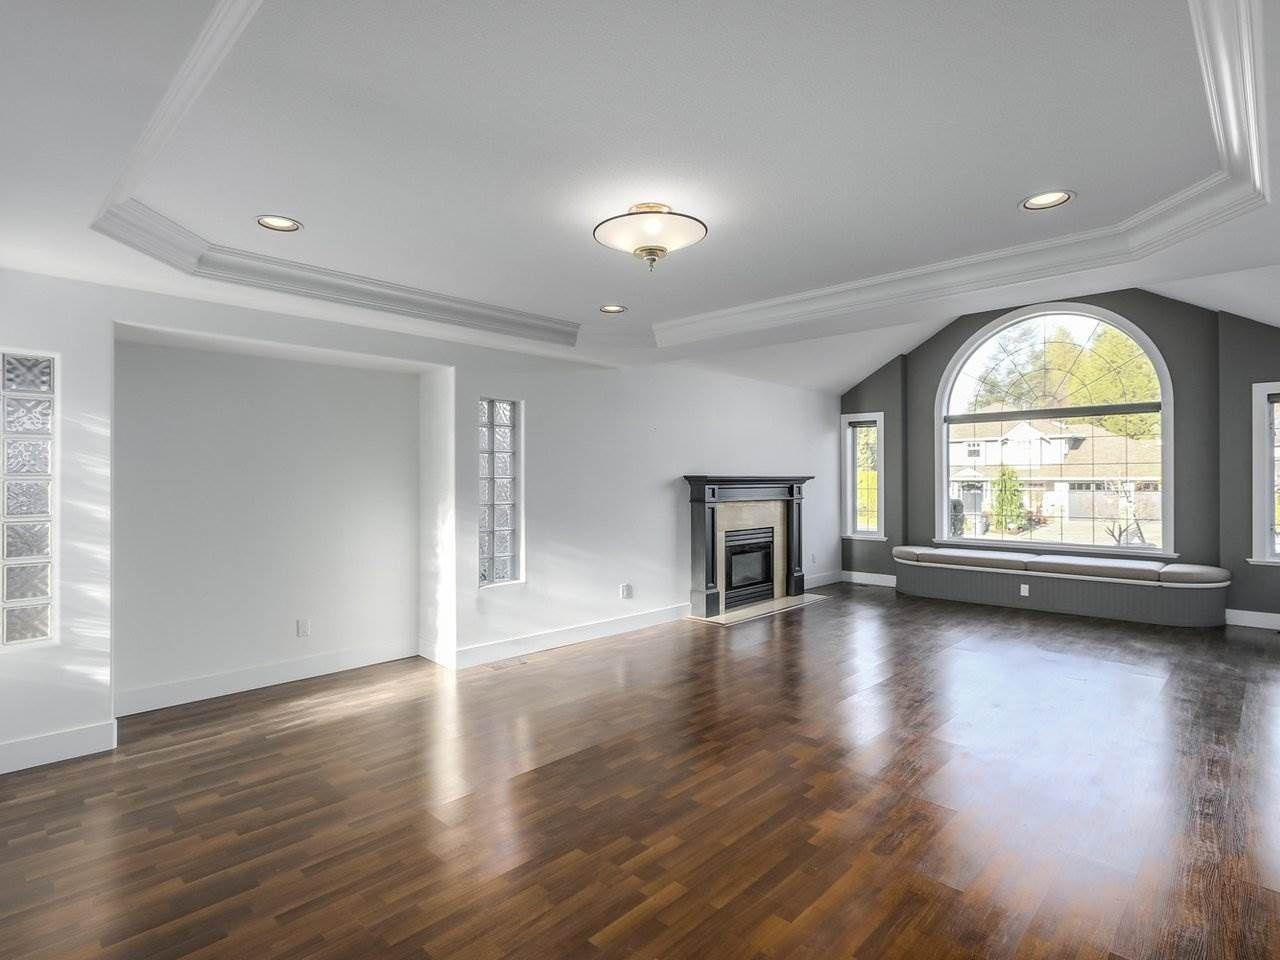 Photo 7: Photos: 12548 25A Avenue in Surrey: Crescent Bch Ocean Pk. House for sale (South Surrey White Rock)  : MLS®# R2328780